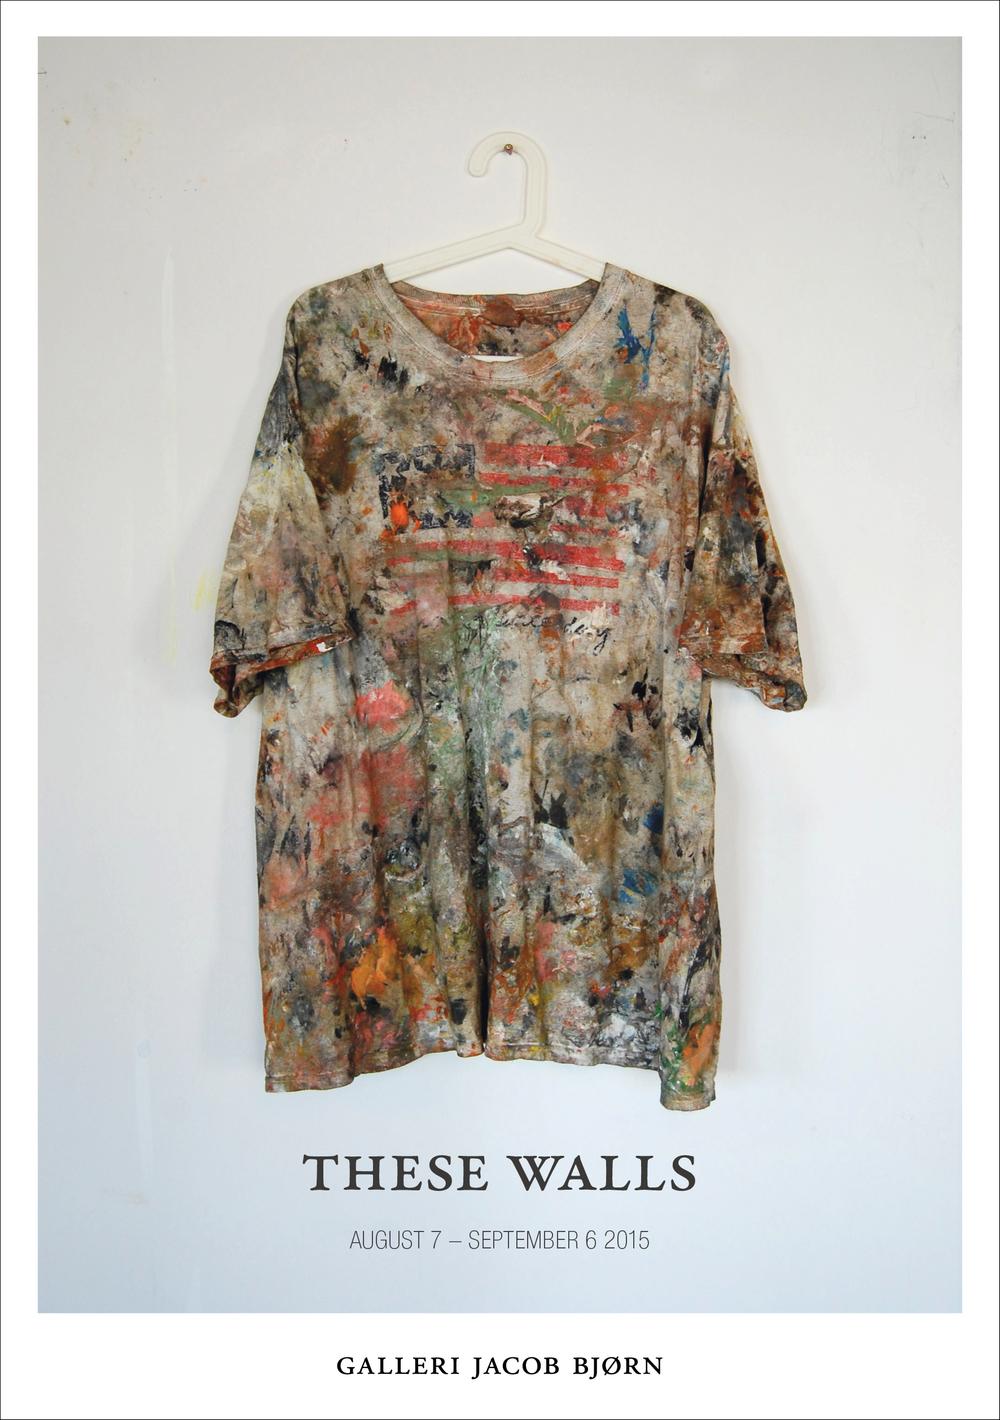 plakat, these walls, ramme.jpg